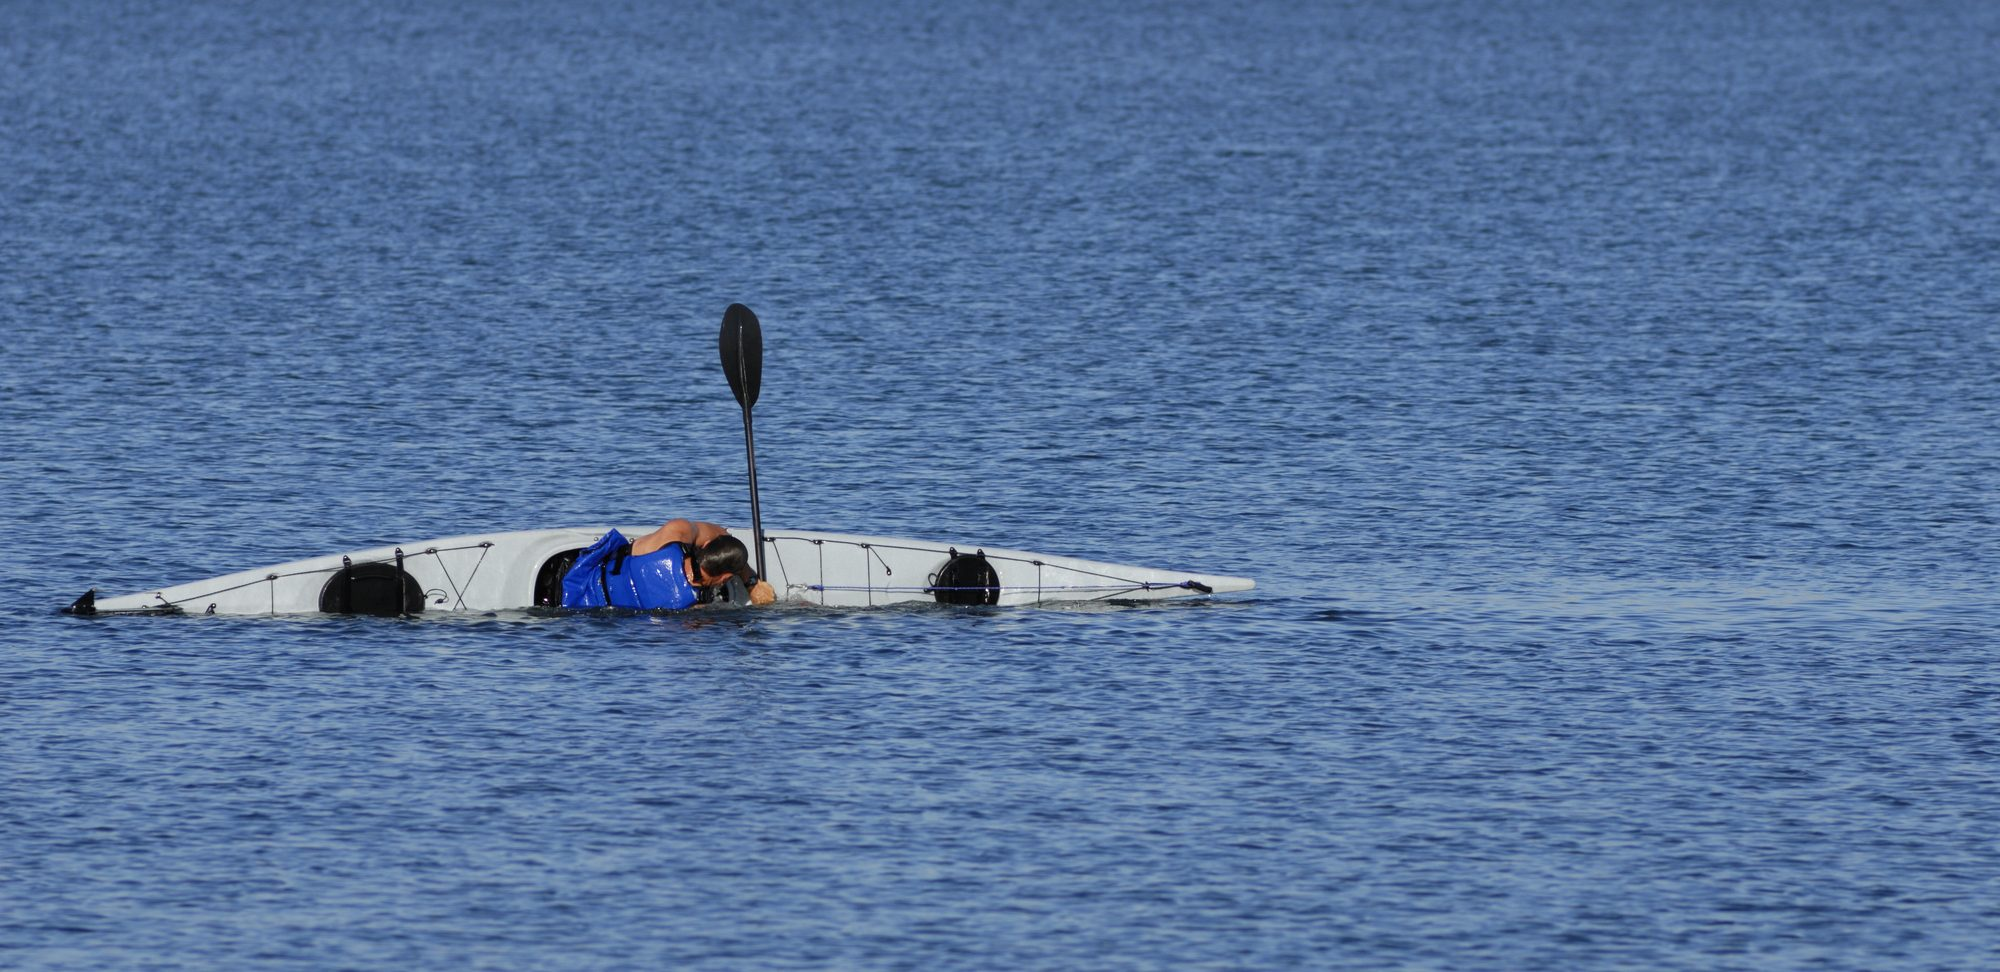 kayaker in open water performing eskimo roll